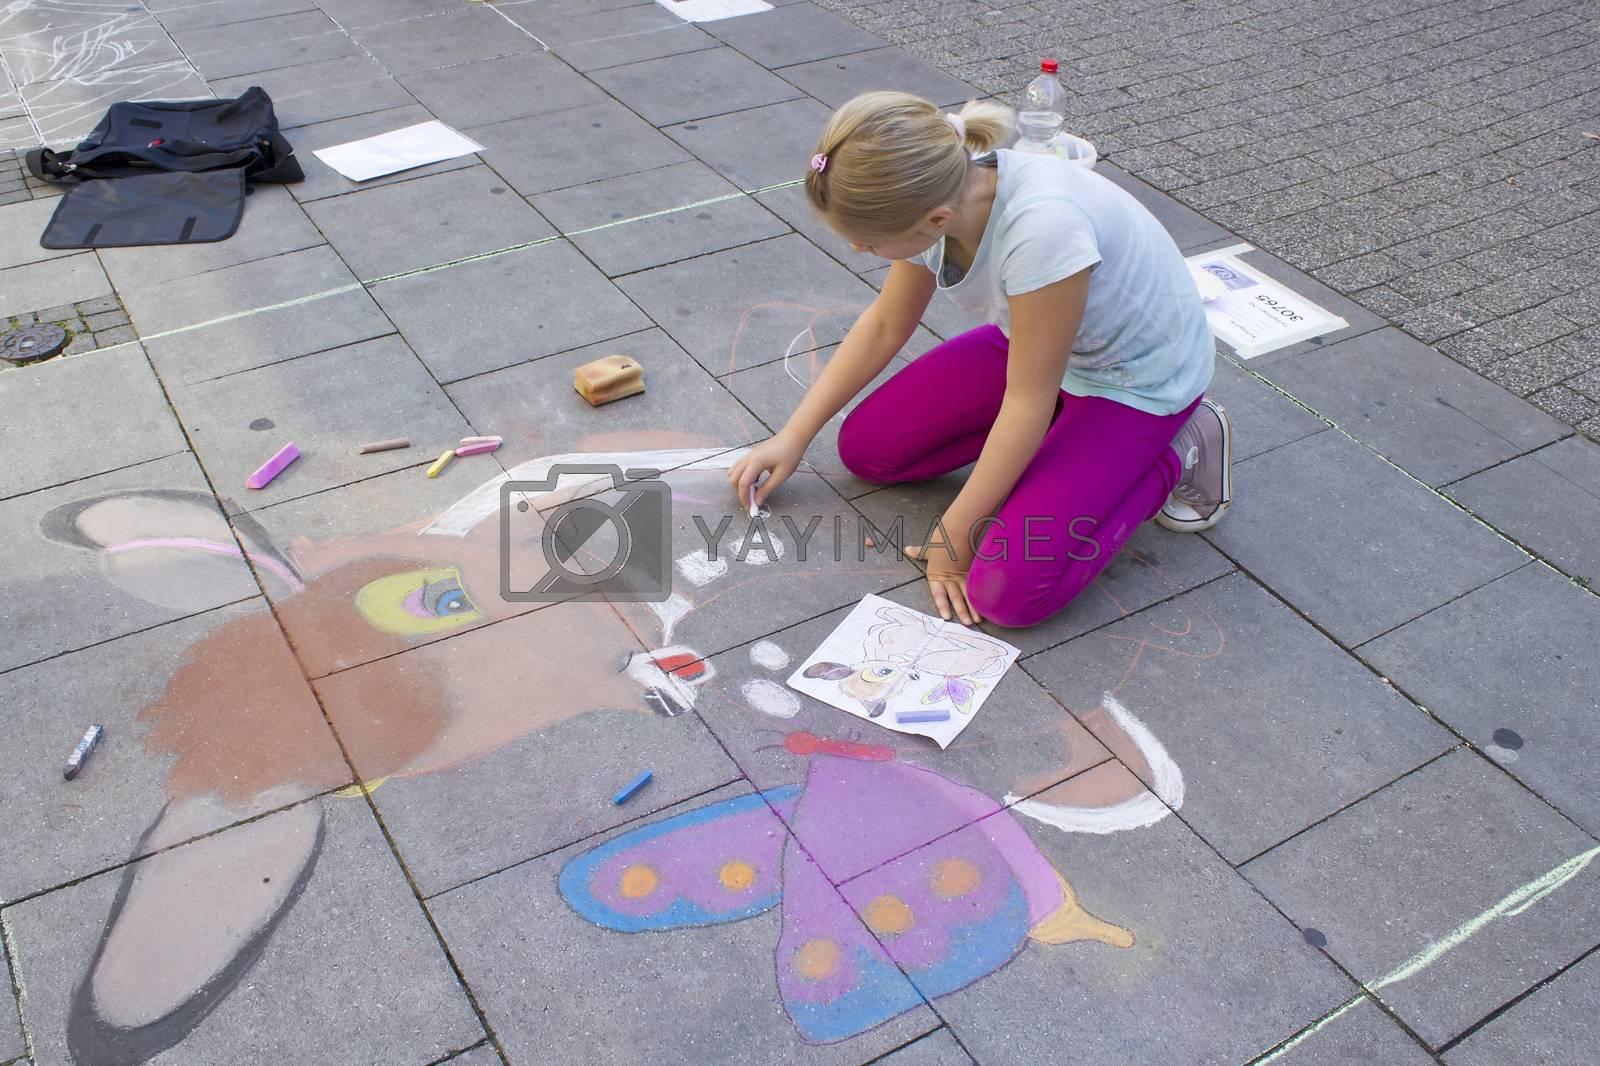 street painting in Geldern, Germany by miradrozdowski